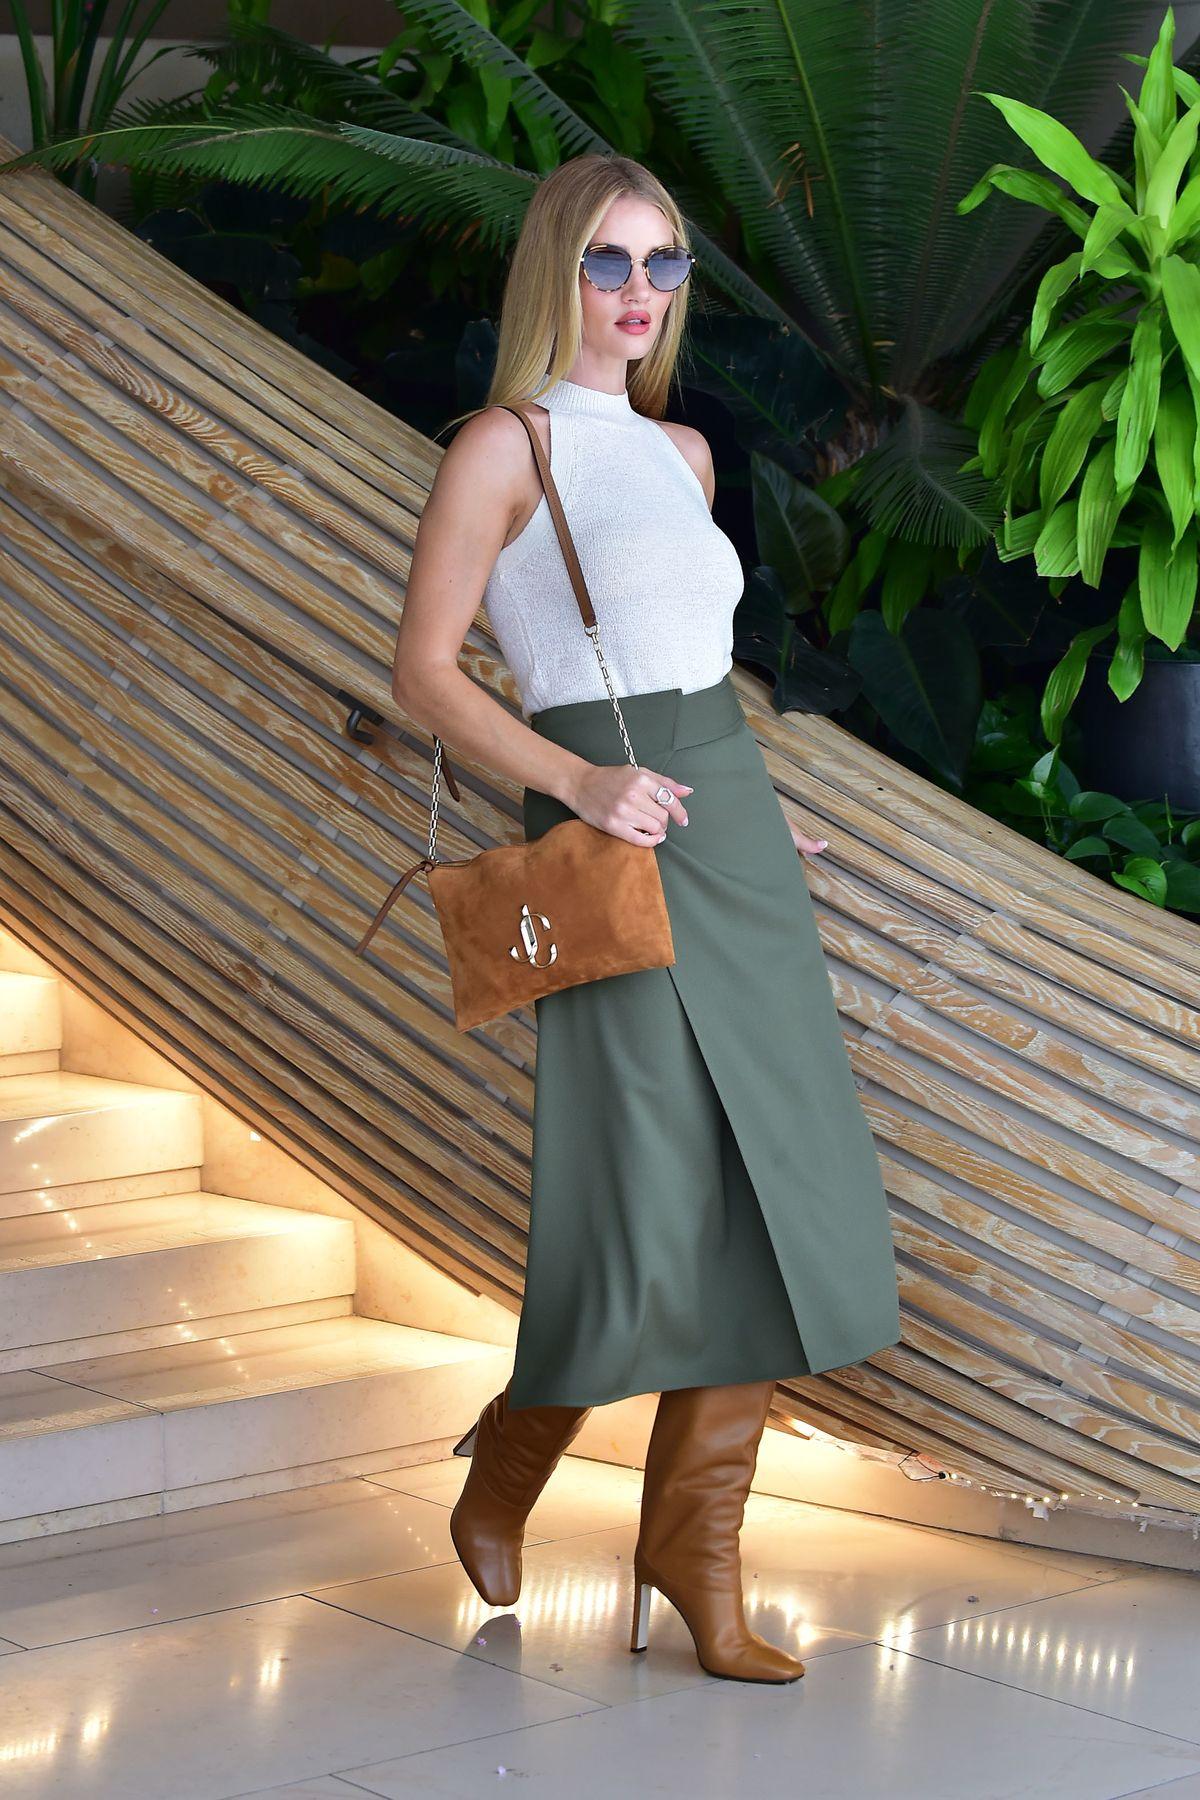 Rosie Huntington-Whiteley trägt unser aktuelles Outfit der Woche (ddp images)